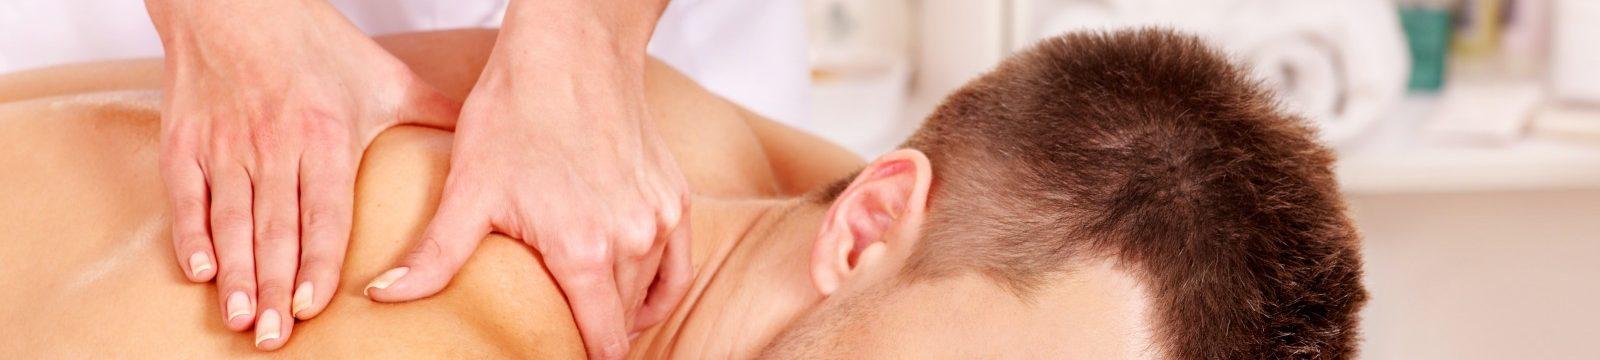 masaje descontracturante barcelona